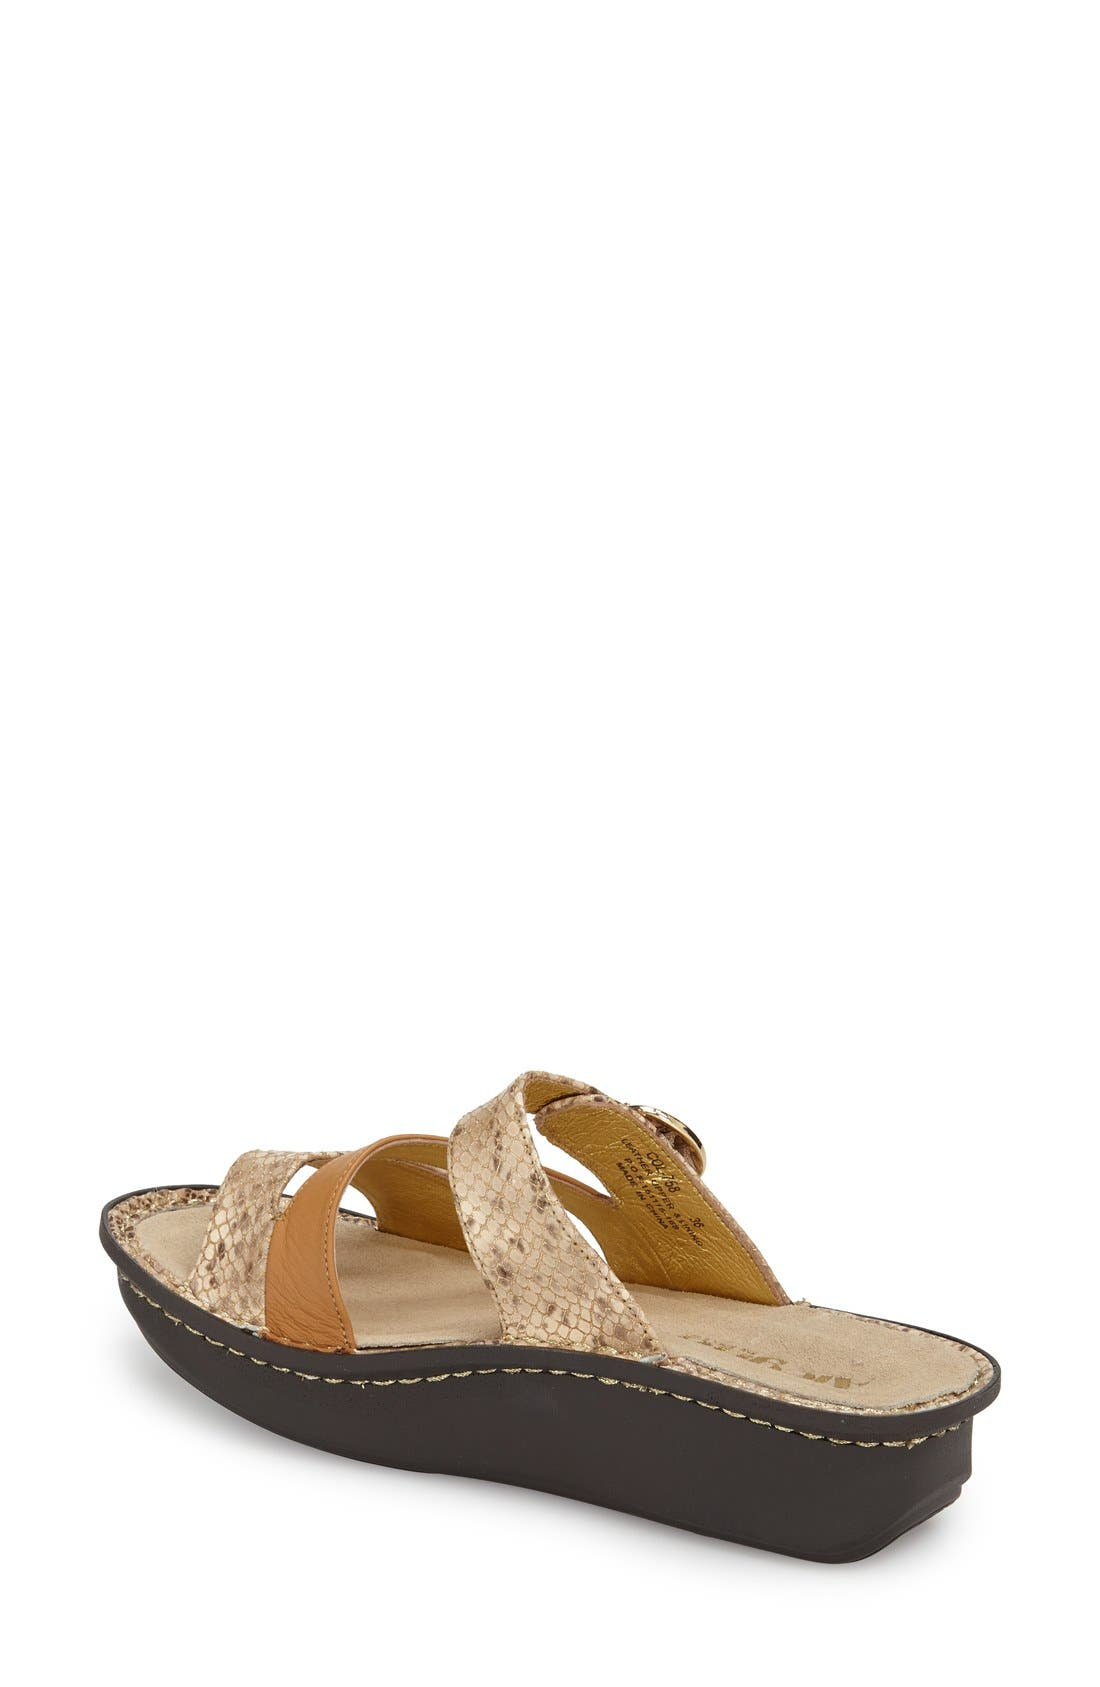 'Colette' Platform Sandal,                             Alternate thumbnail 60, color,